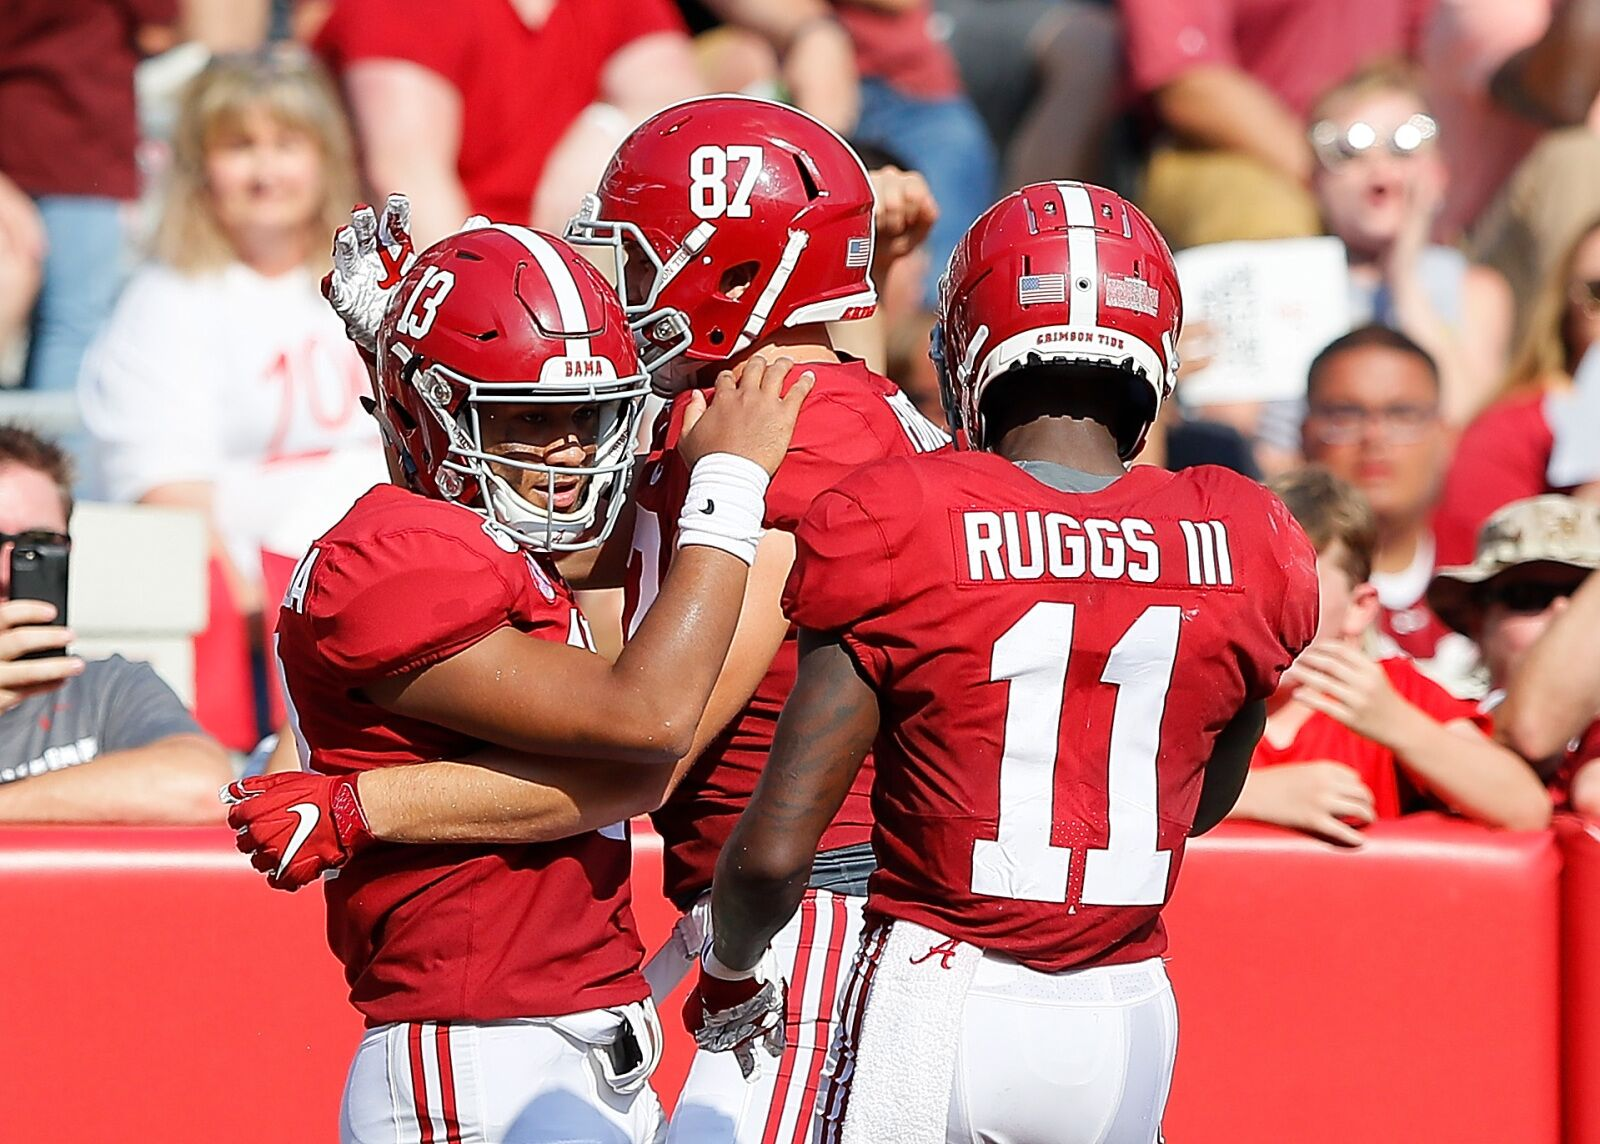 Alabama football looks to keep rolling in SEC opener at South Carolina